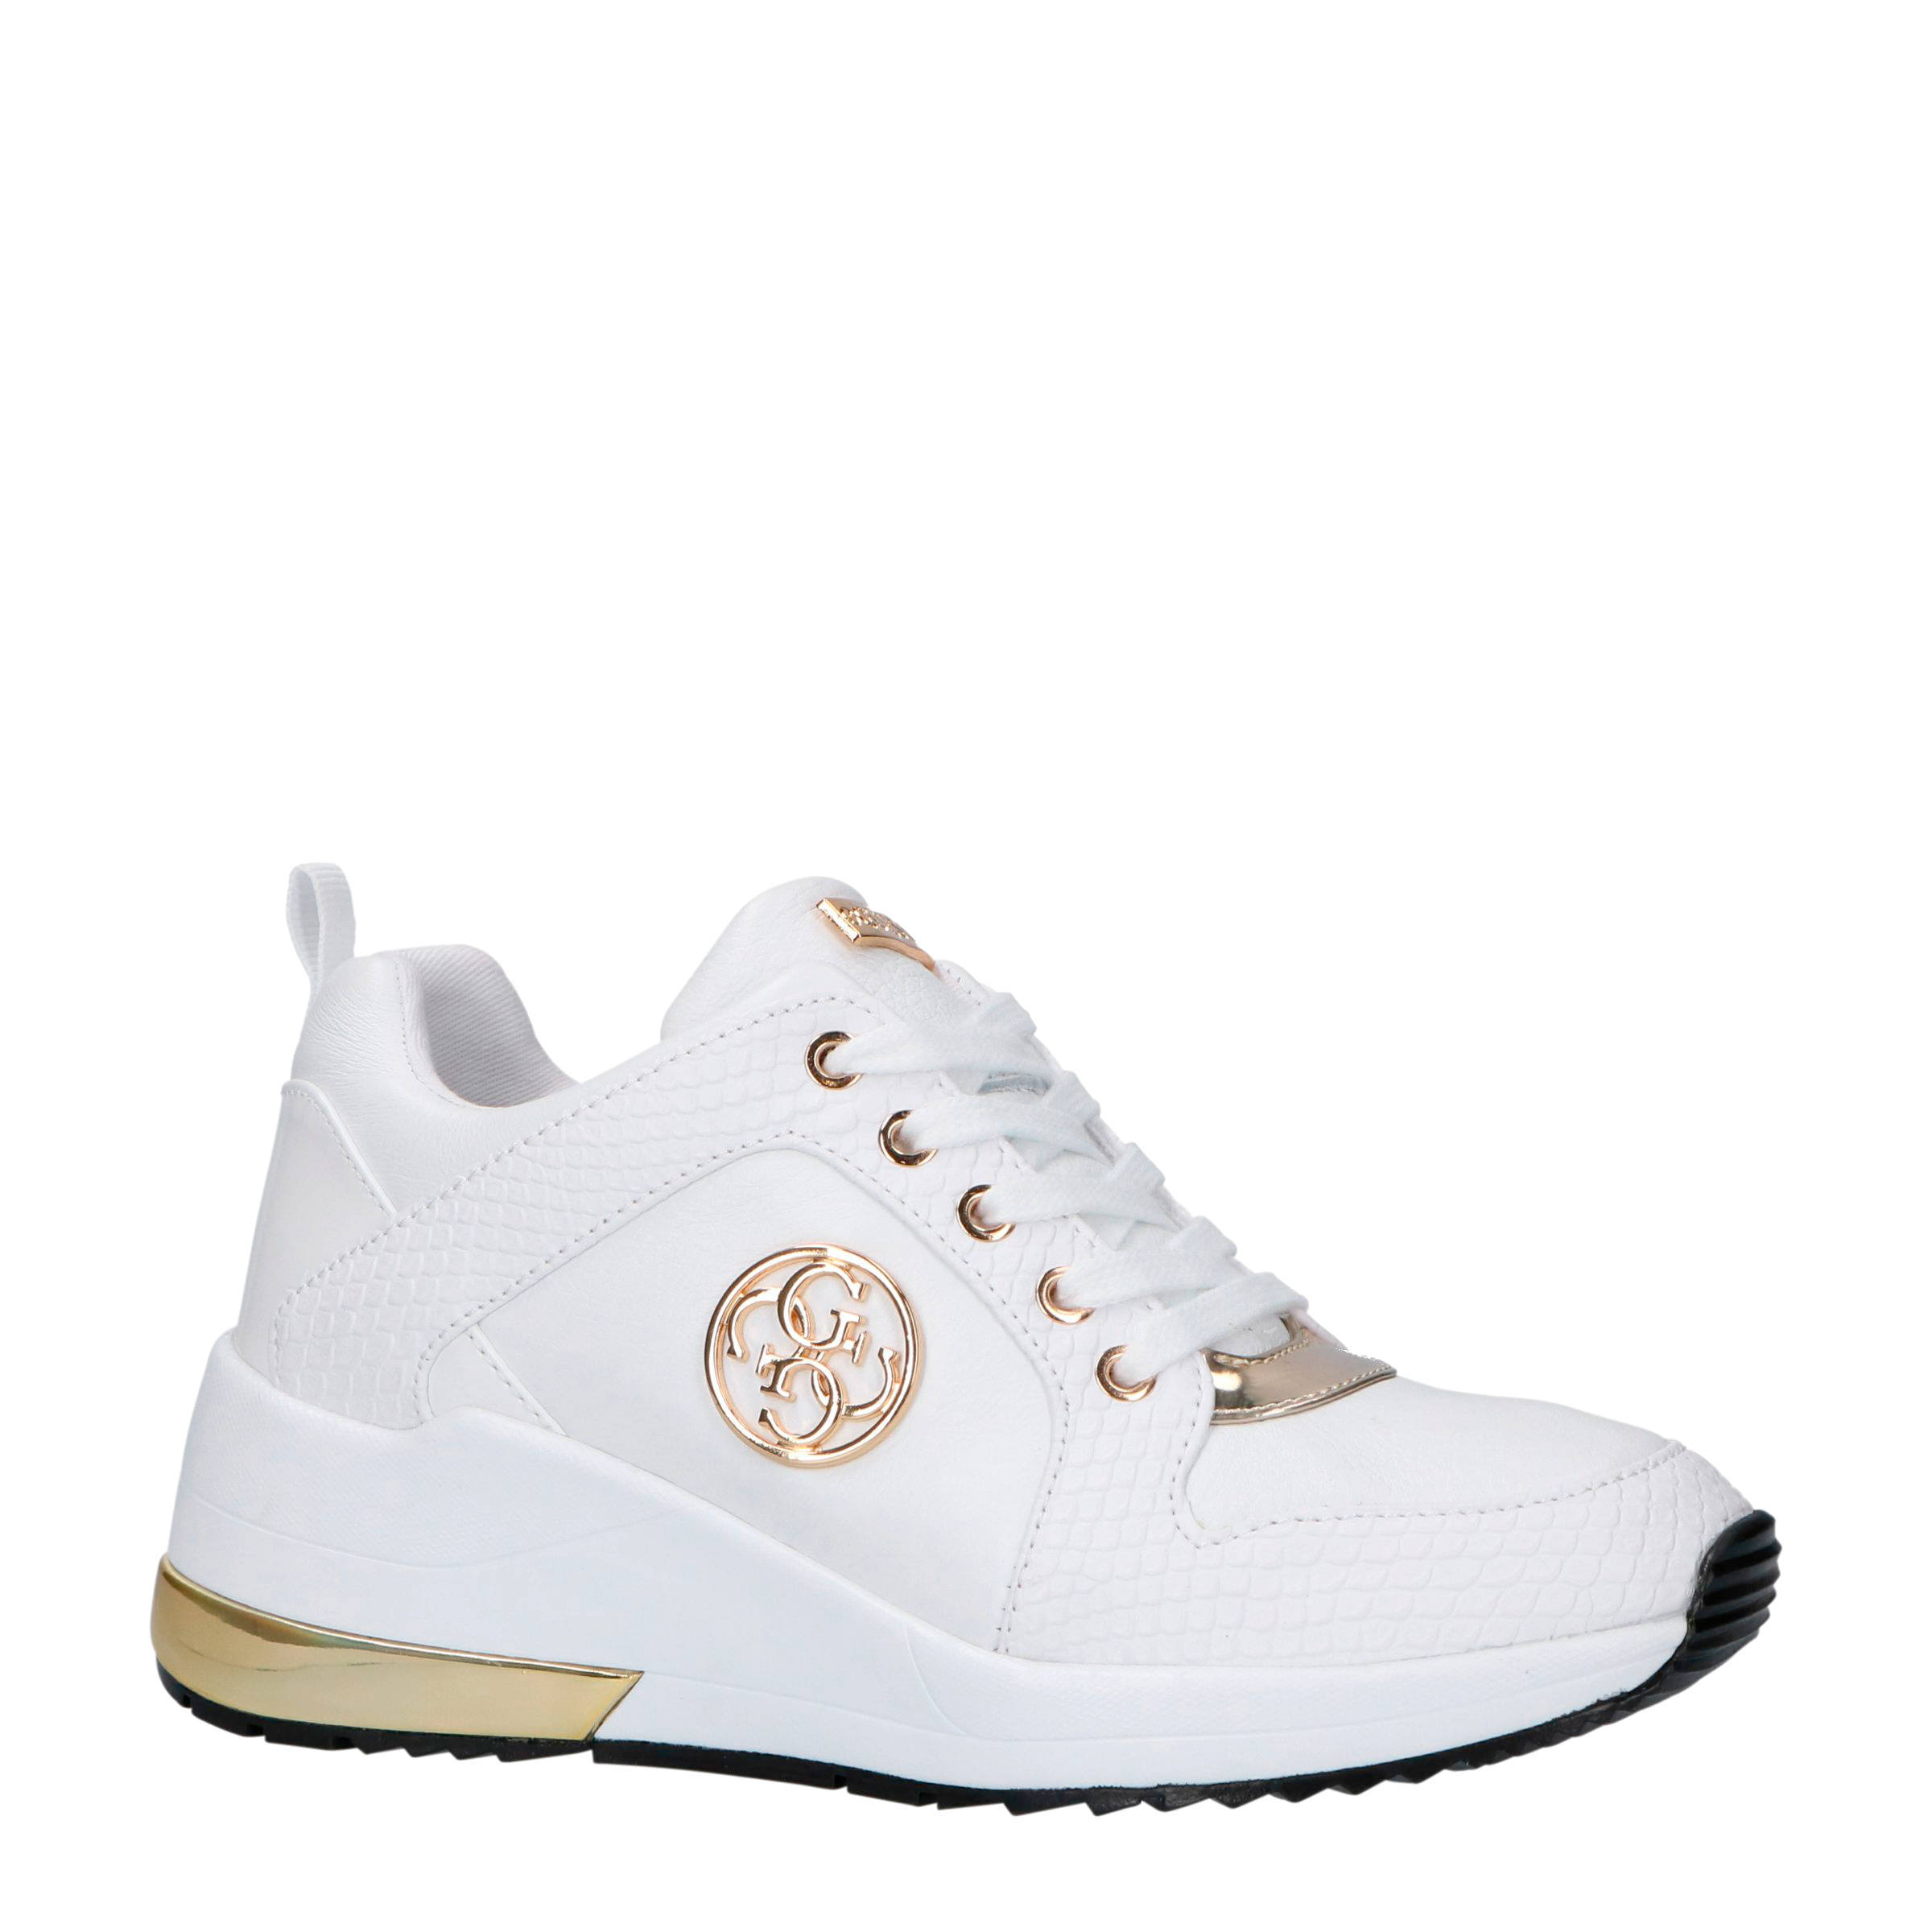 Jaryd2 leren sneakers wit